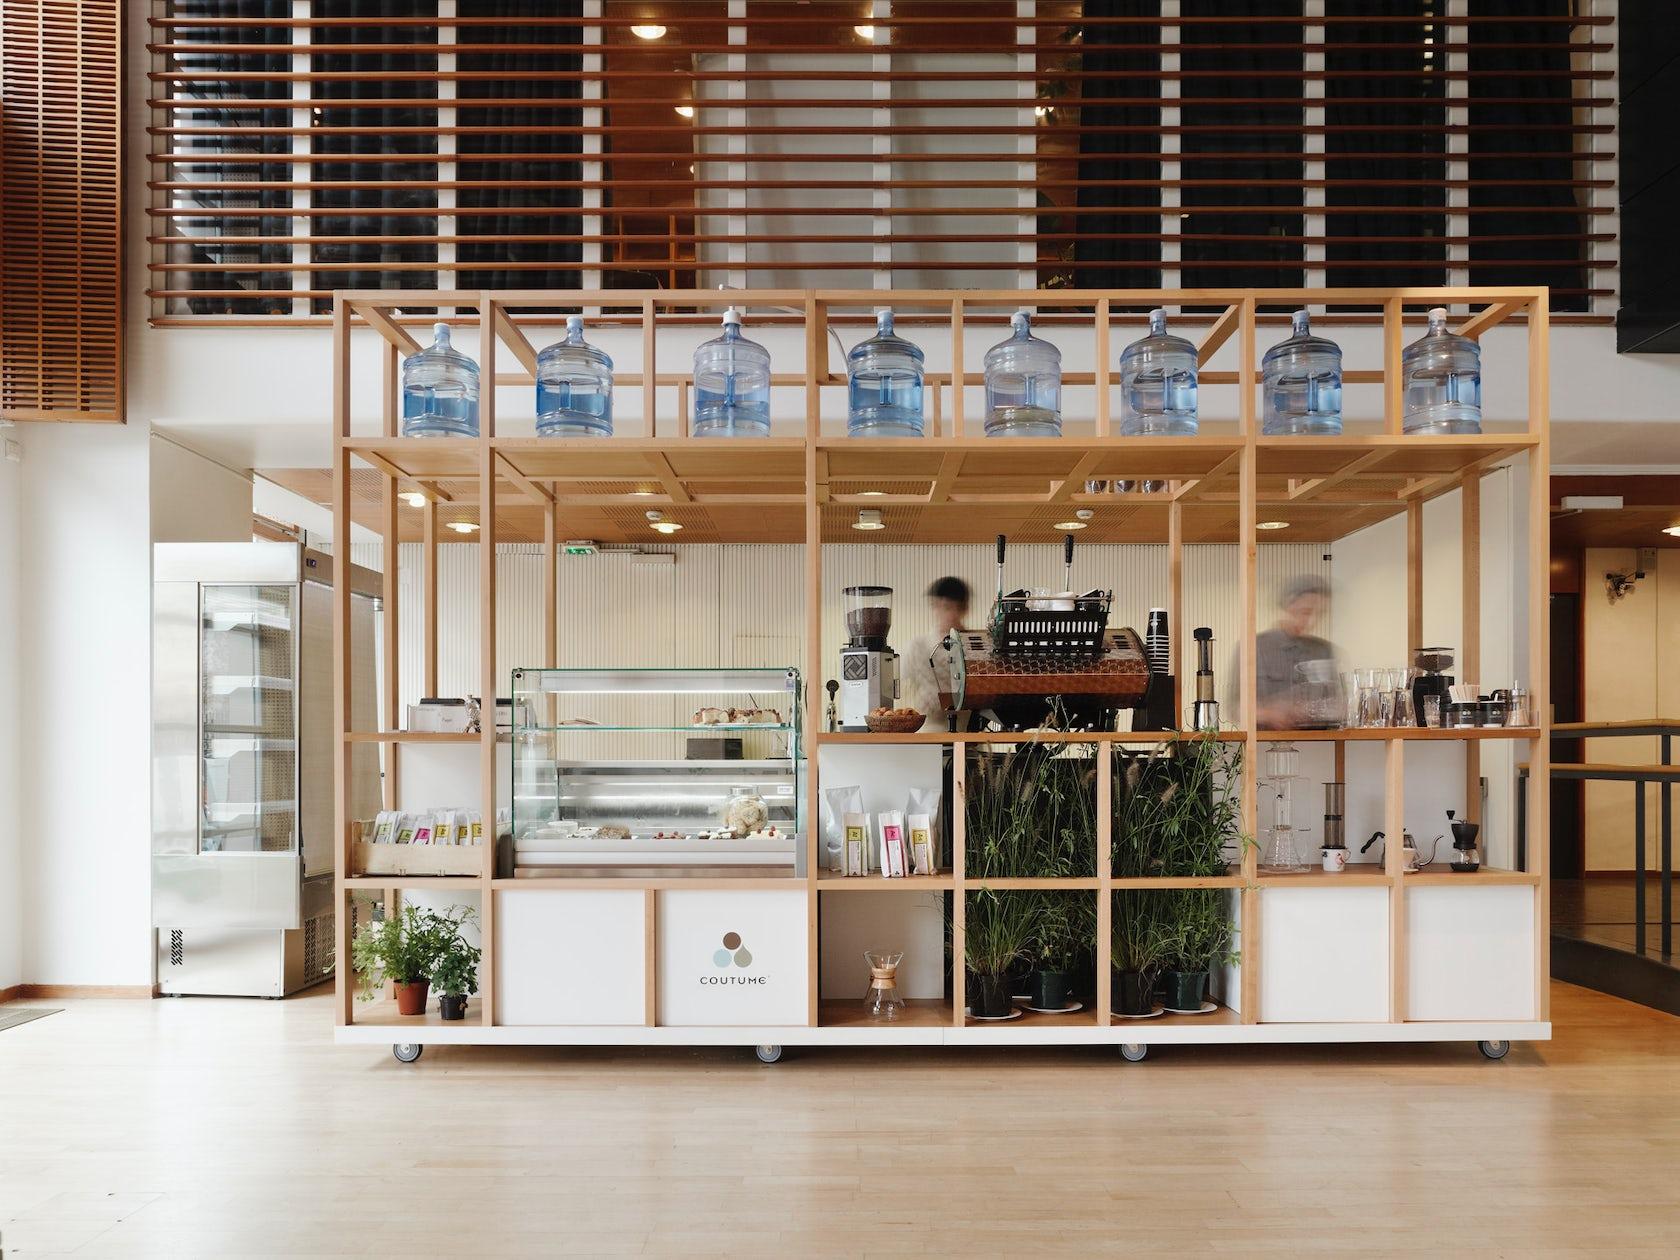 coutume cart paris finnish institute architizer. Black Bedroom Furniture Sets. Home Design Ideas